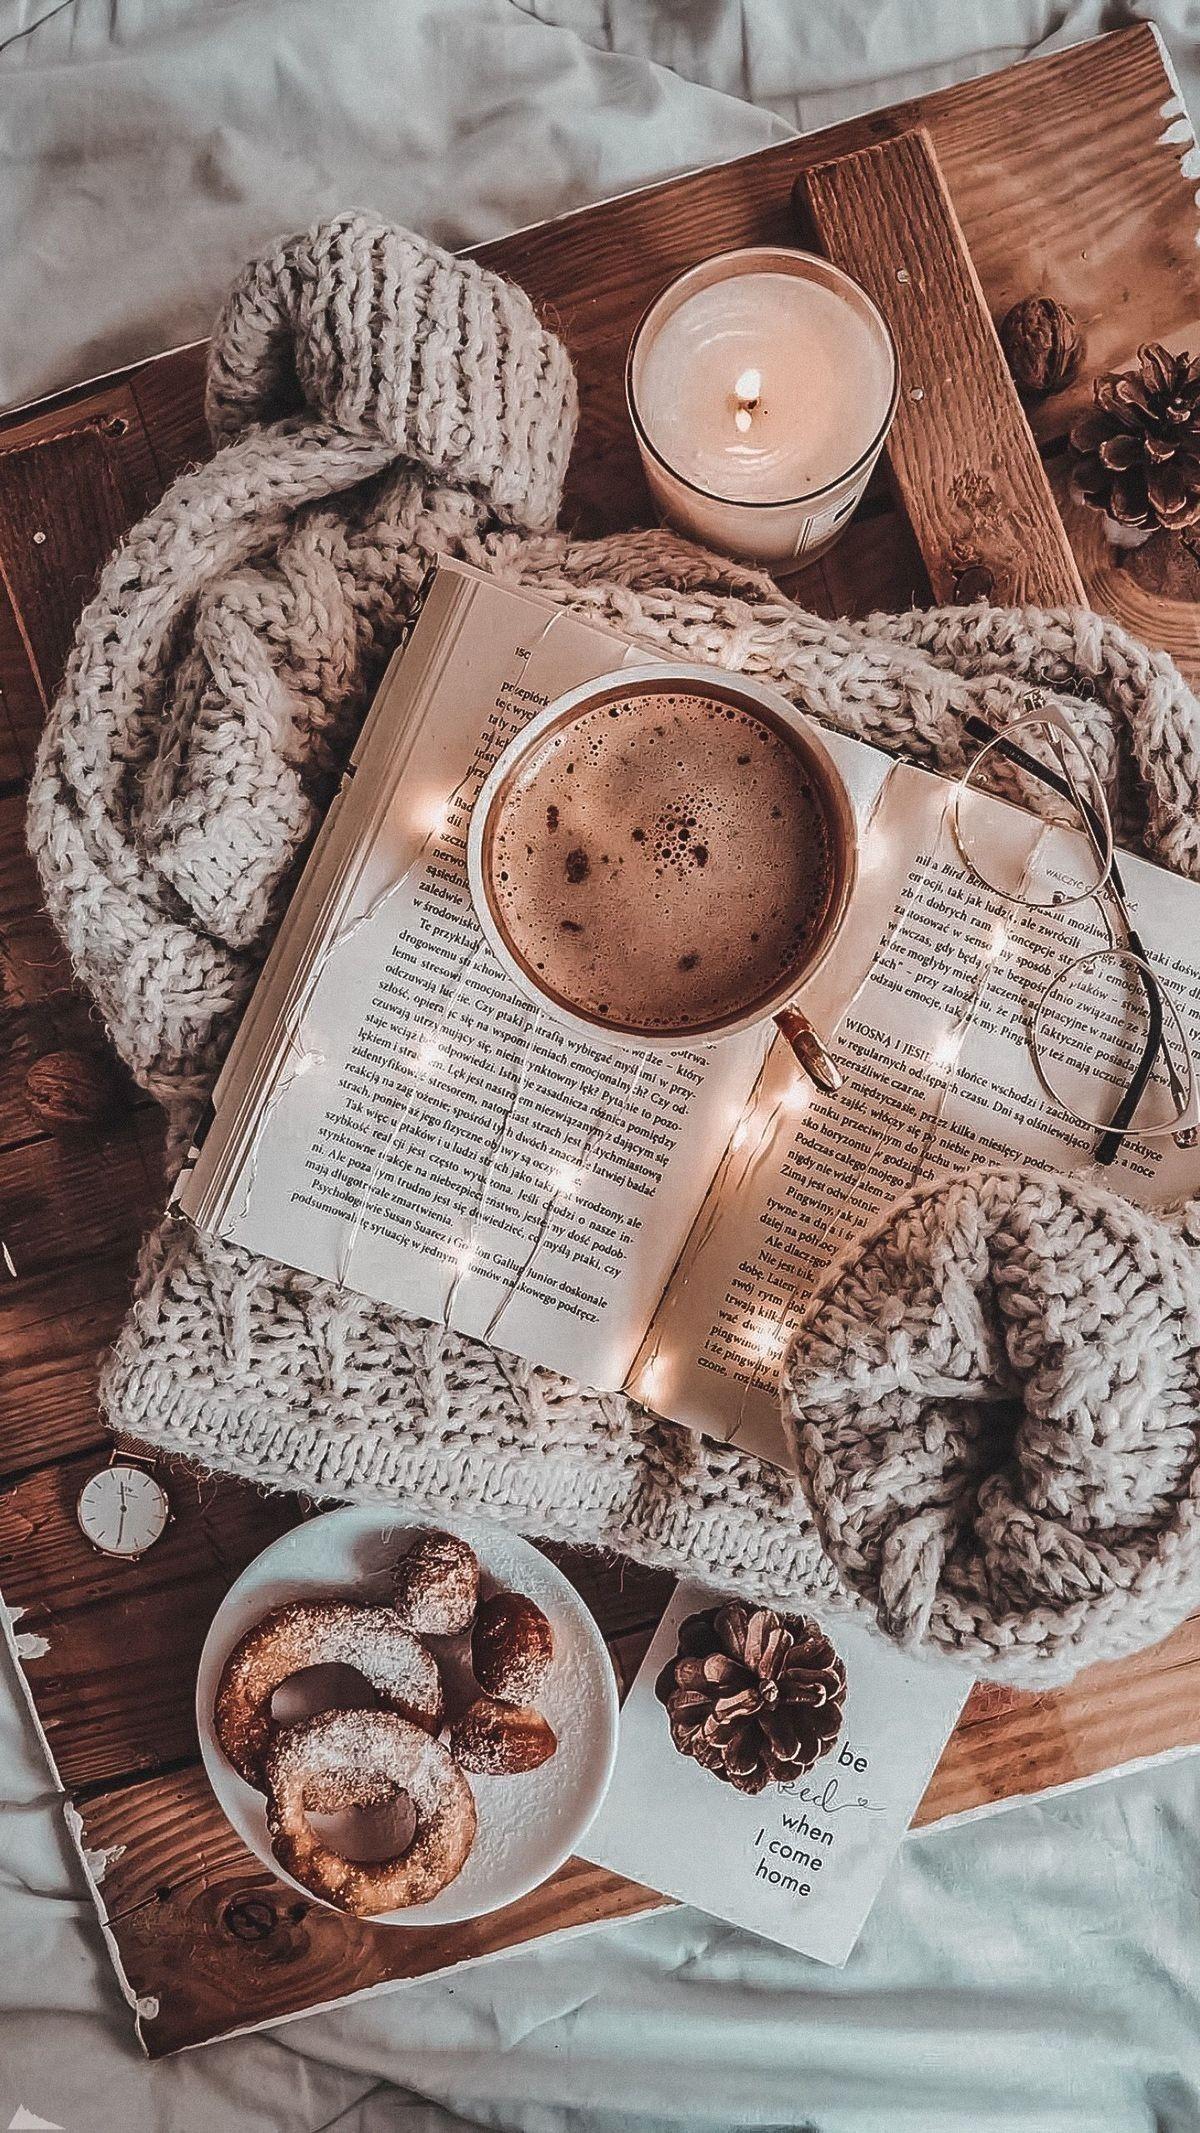 Pin by Coffee قهوة on ☄ تصاميم Cozy aesthetic, Autumn